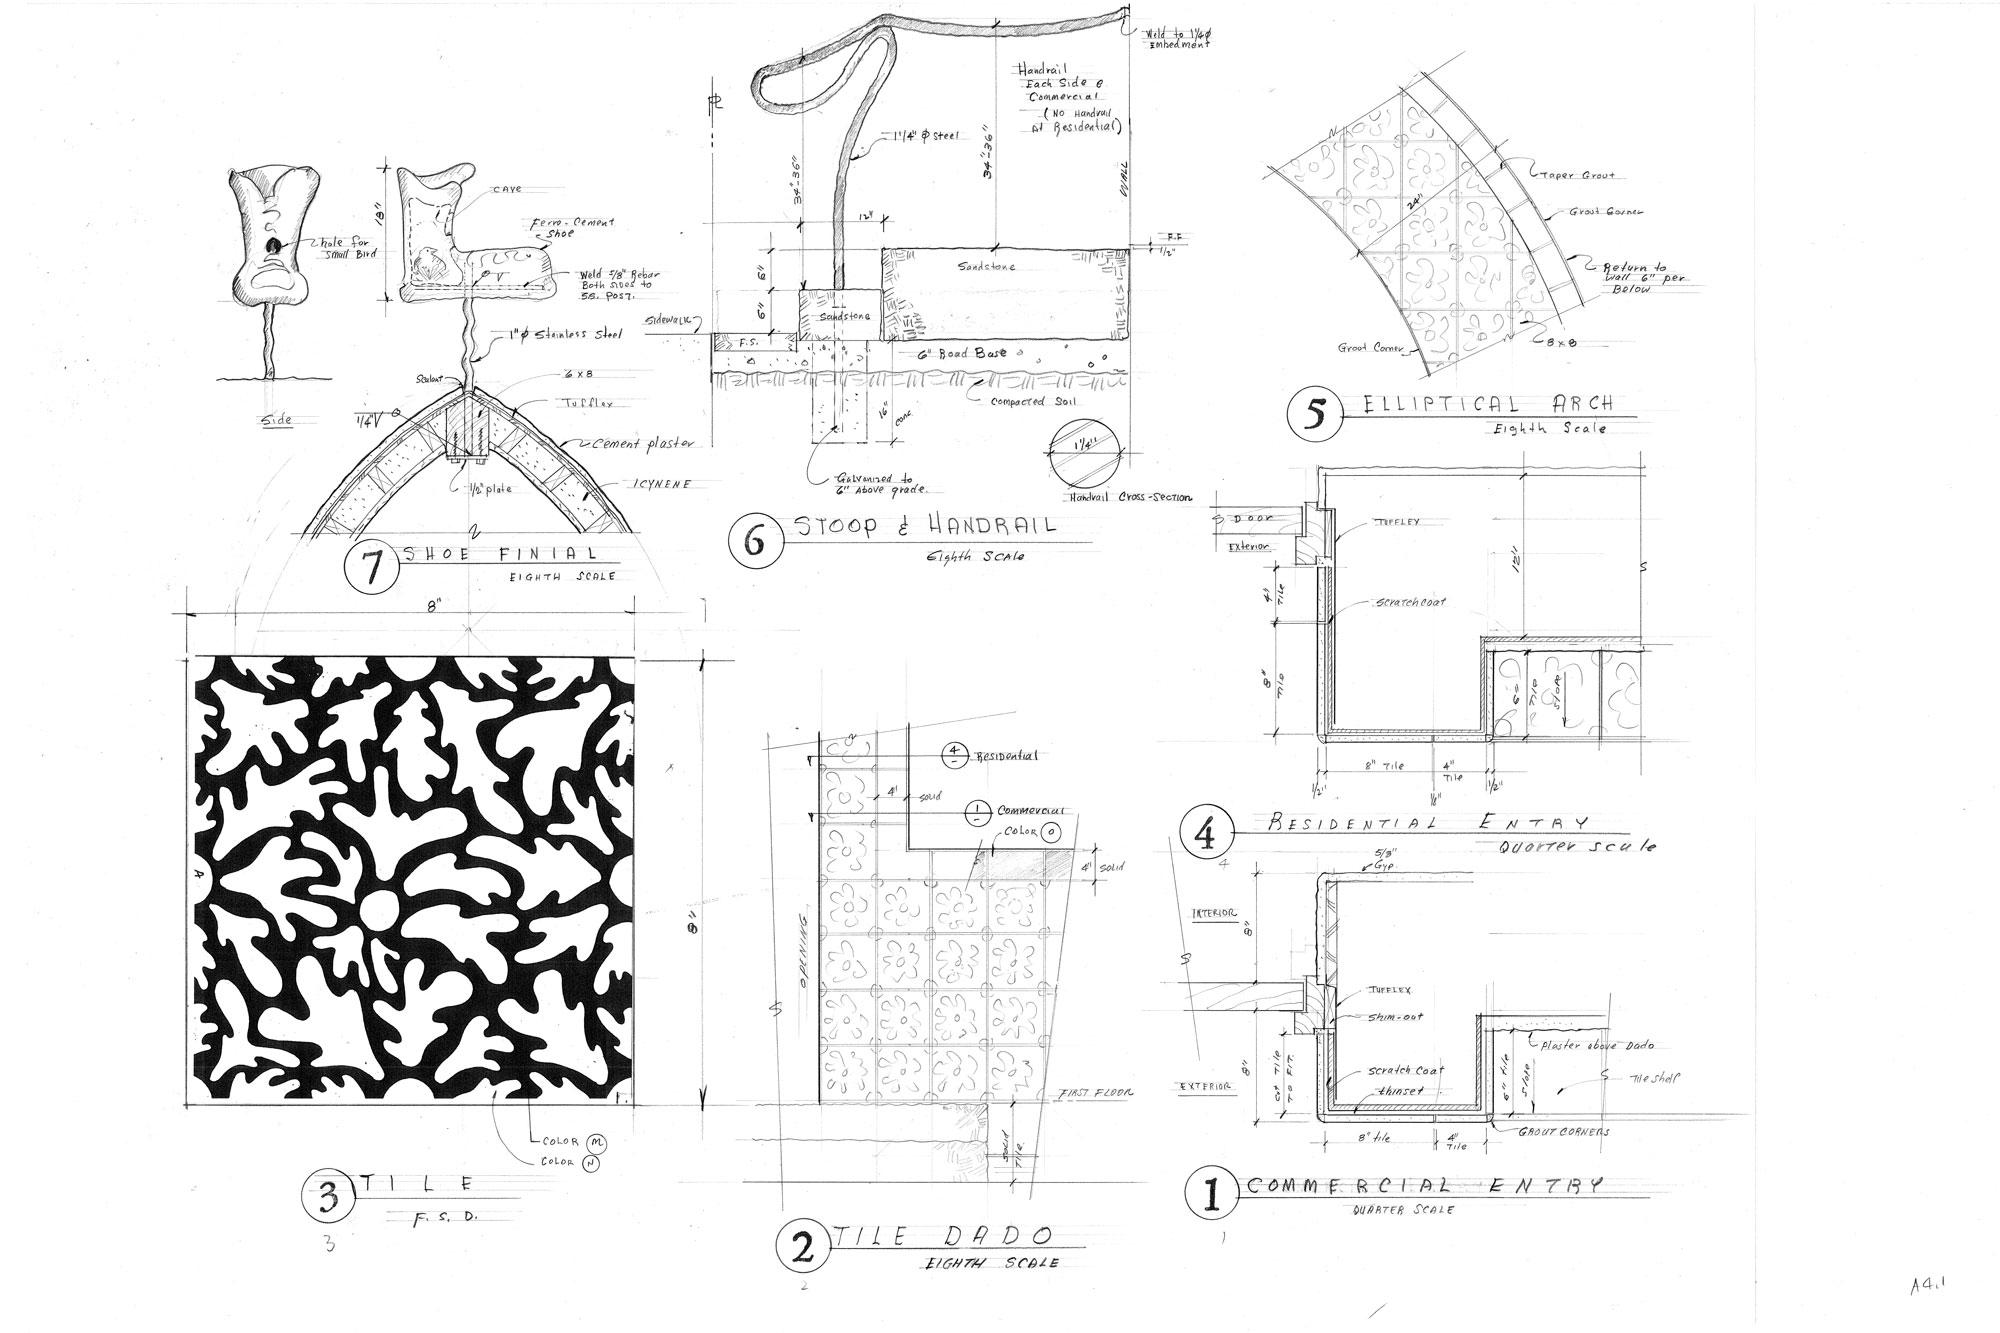 03.04.14-Tile-Details.jpg